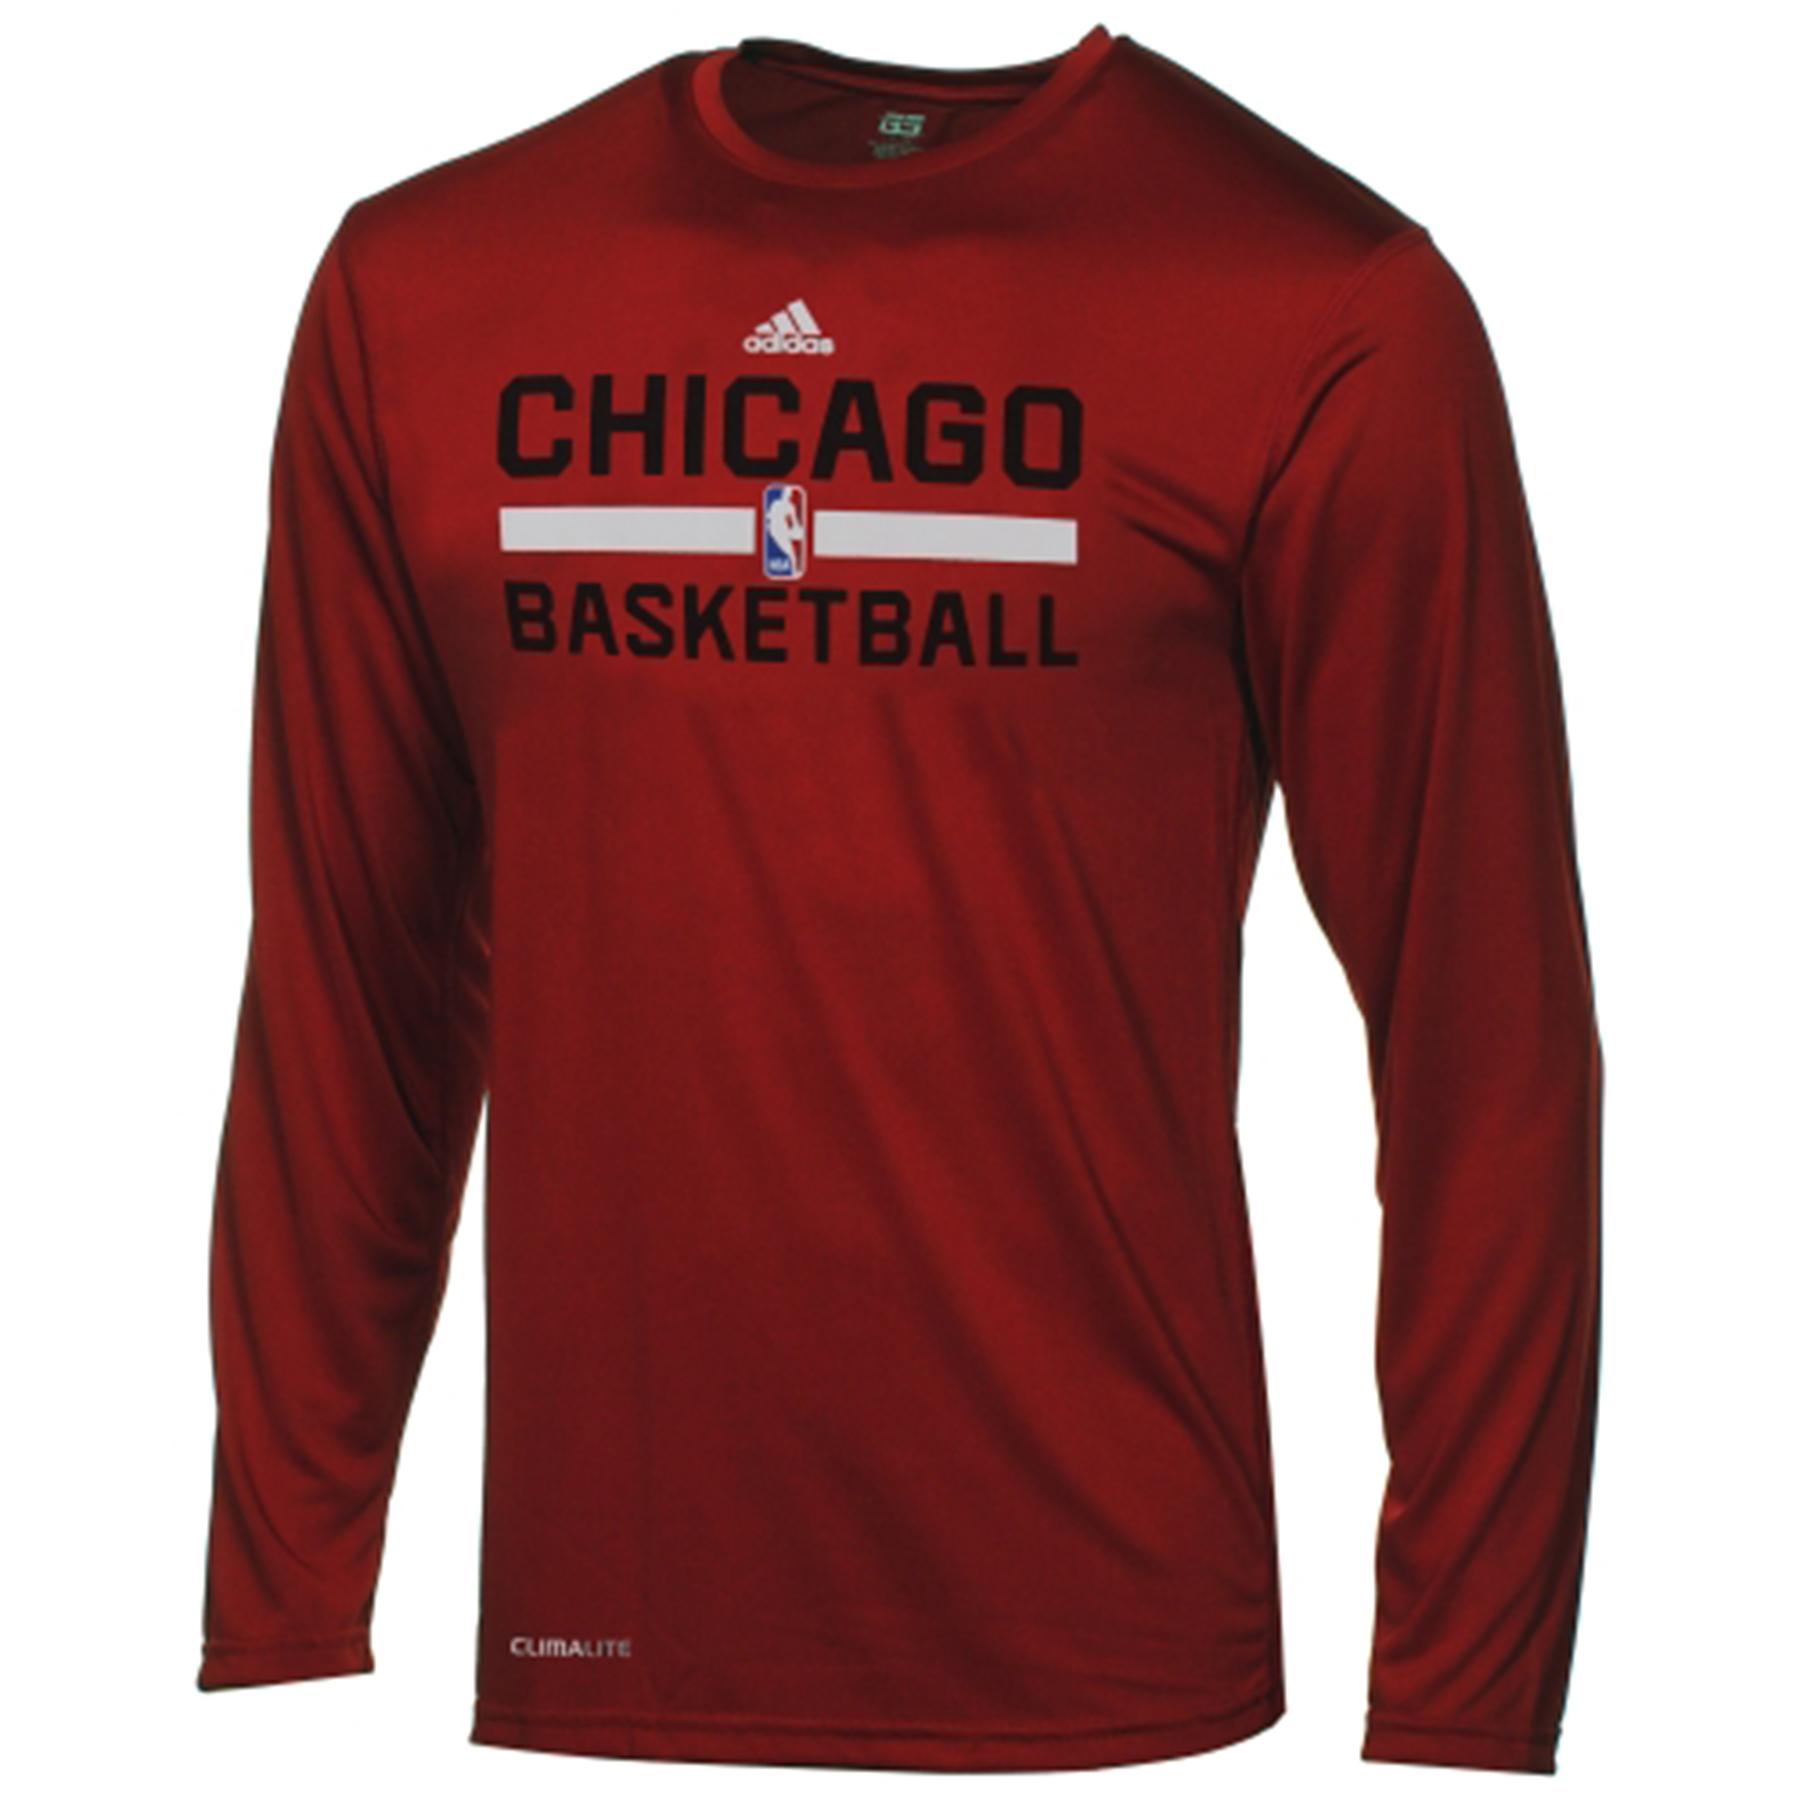 Chicago Bulls adidas ClimaLITE Practise Long Sleeve T-Shirt - Youth